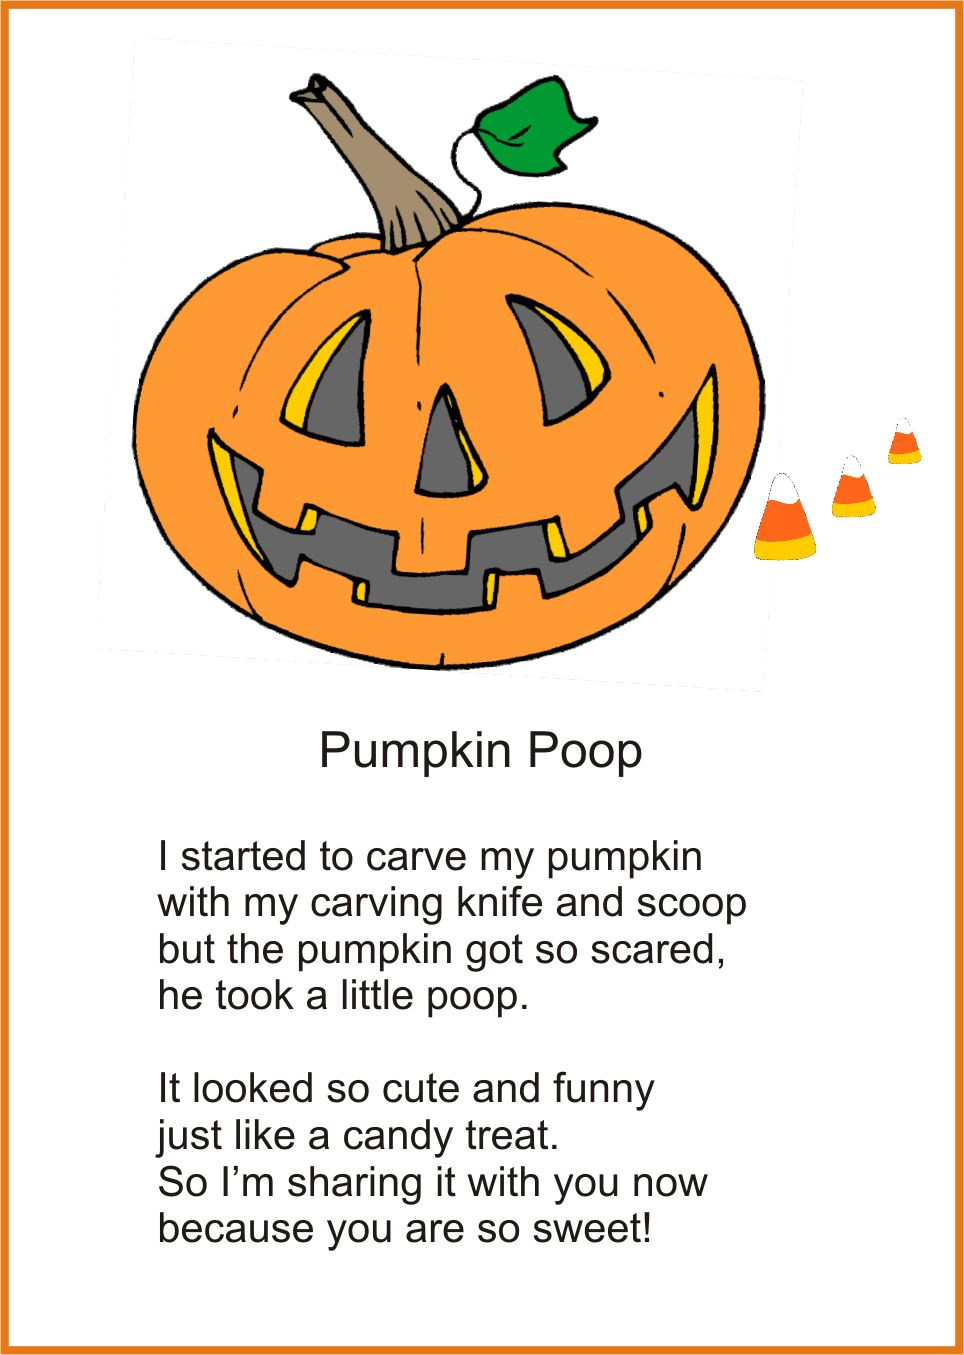 printable pumpkin poop poem for halloween - Funny Halloween Poems For Kids